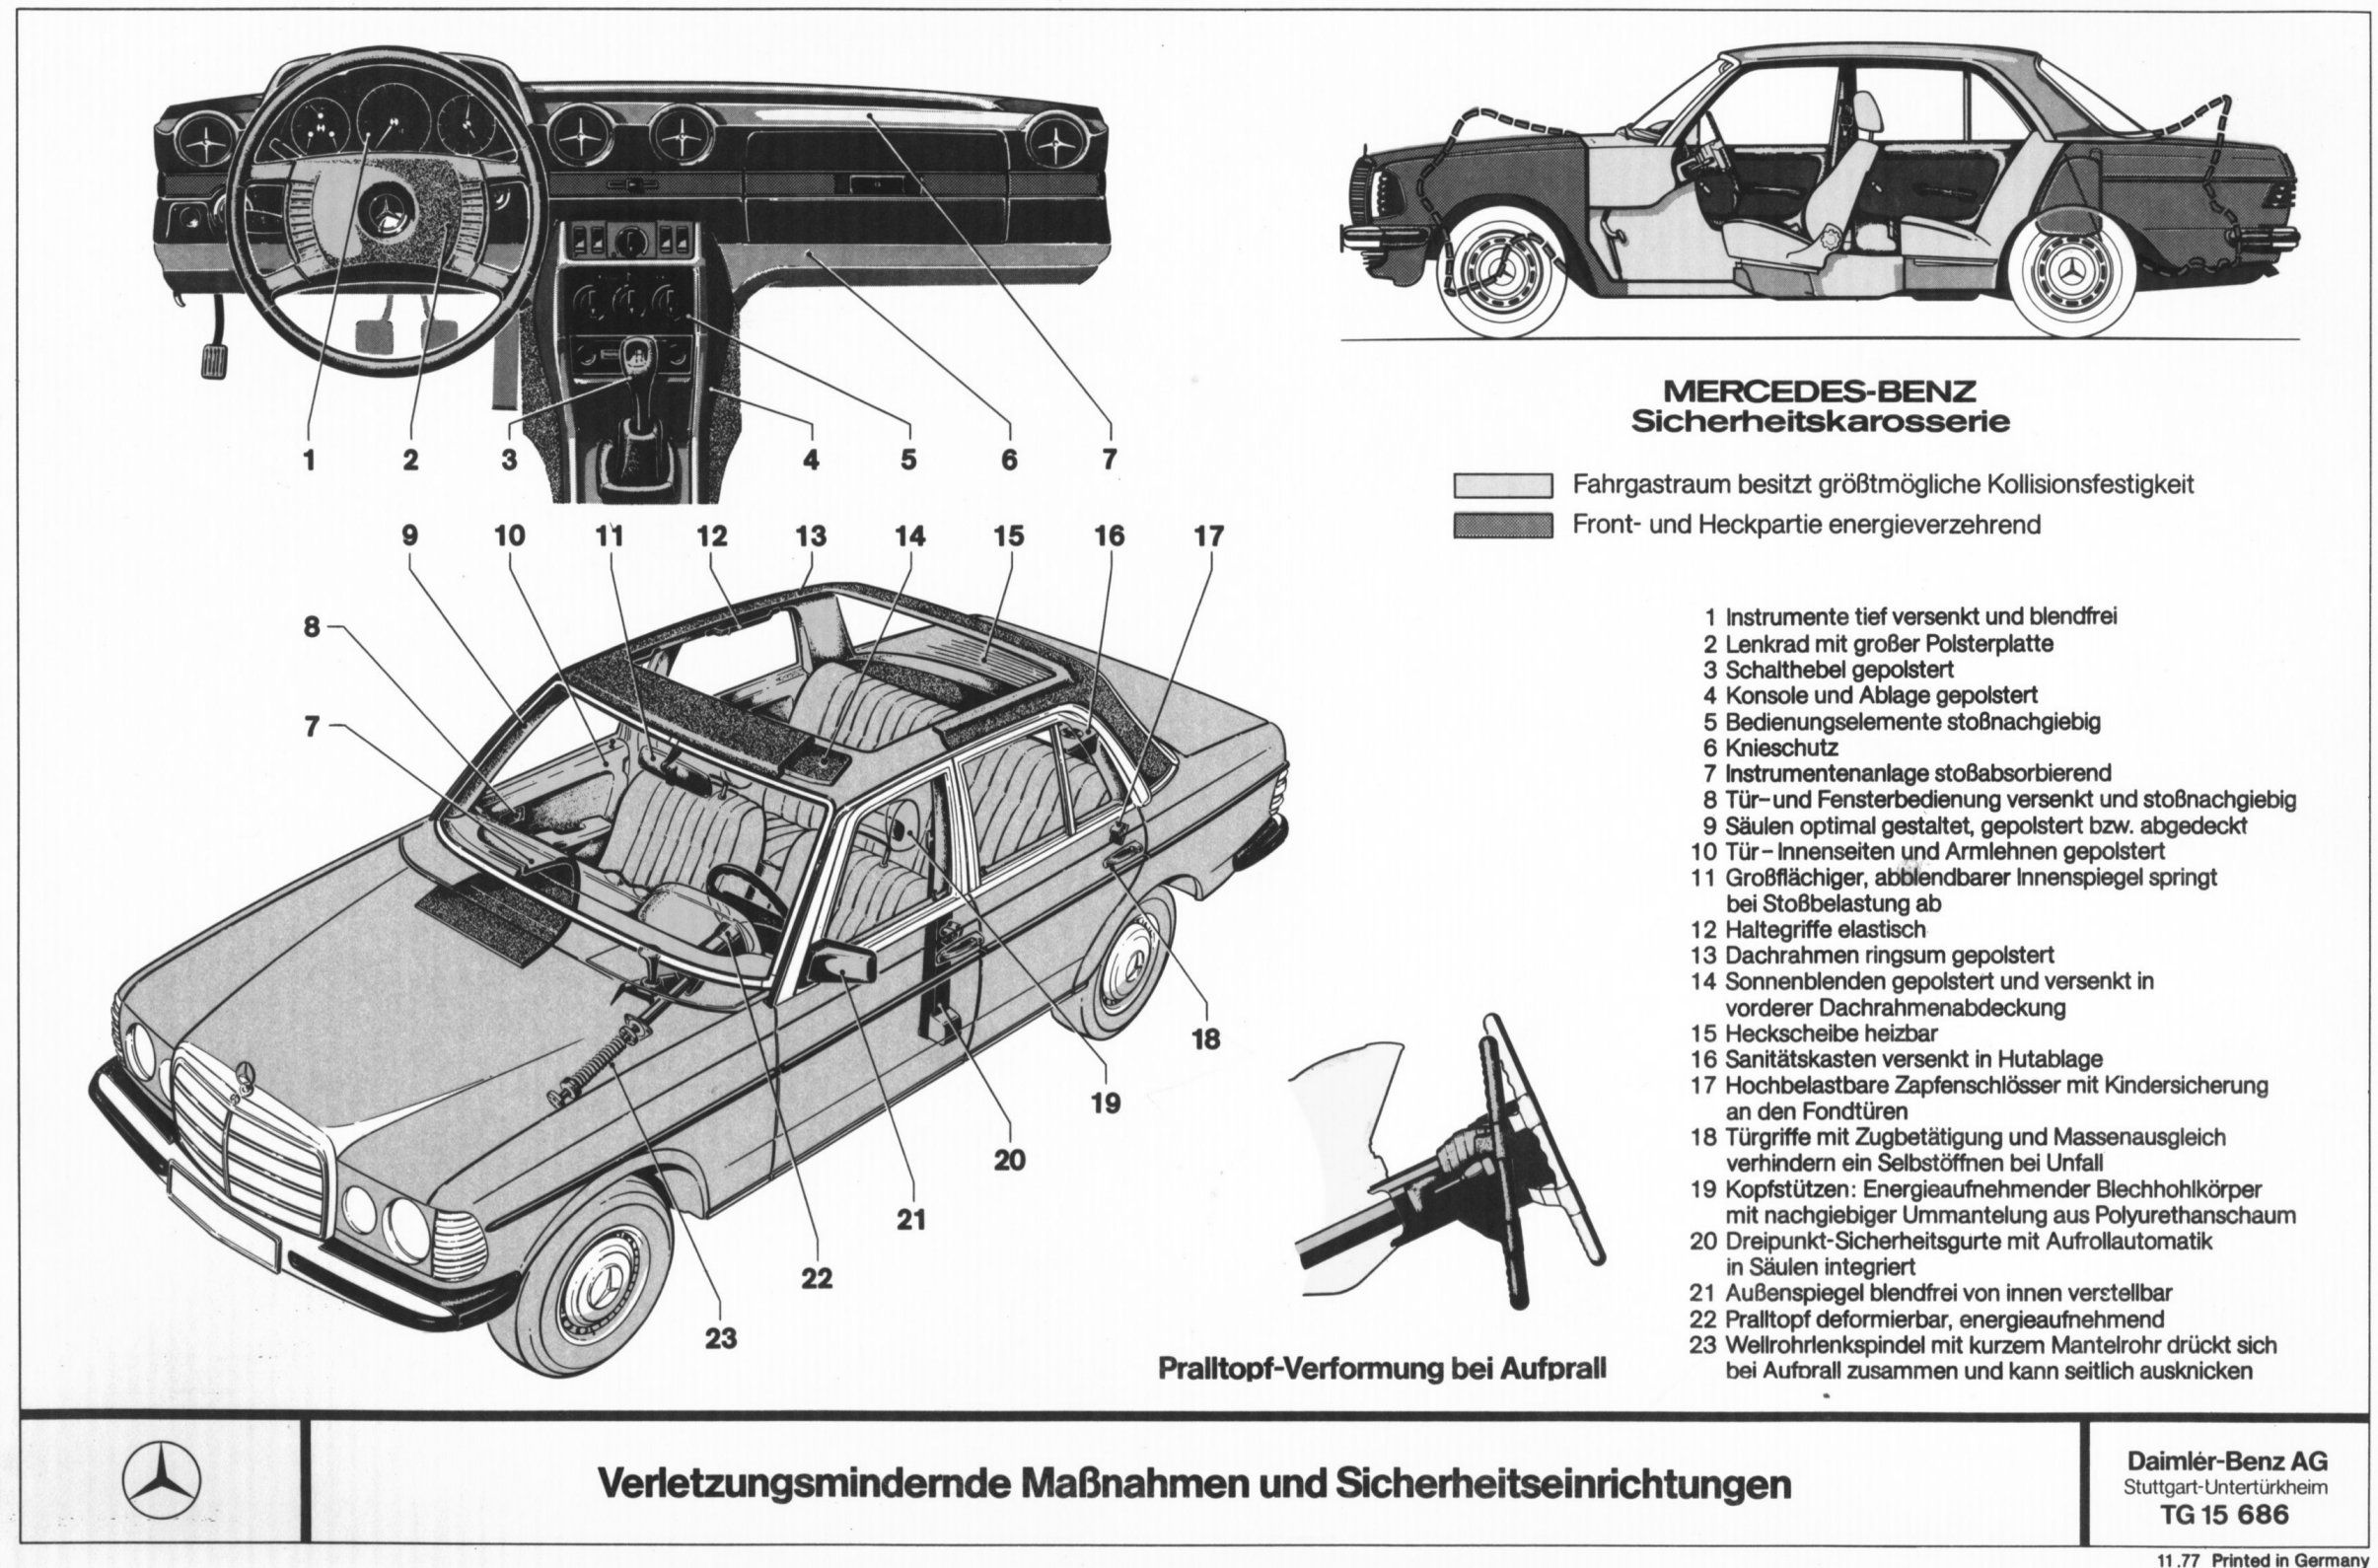 Indragoin39s 1984 MercedesBenz W123280E w123 in 2018